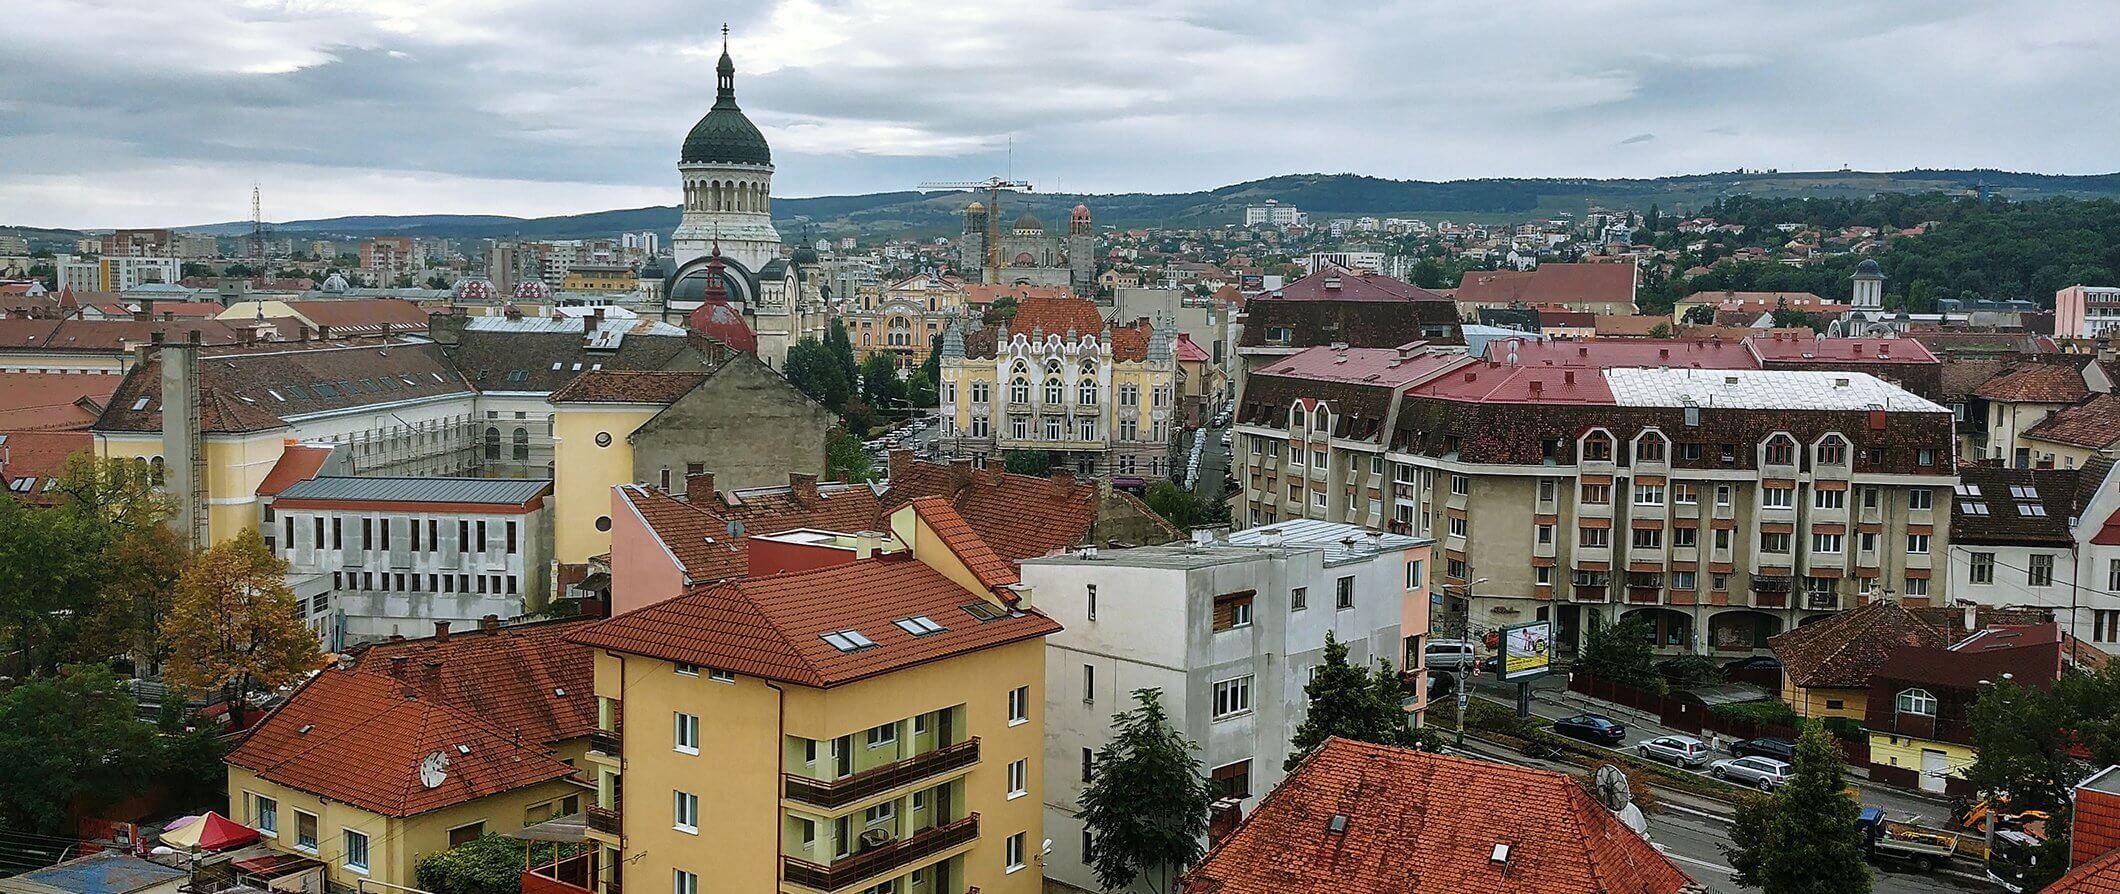 Cheap Insurance Companies >> Cluj-Napoca Travel Guide